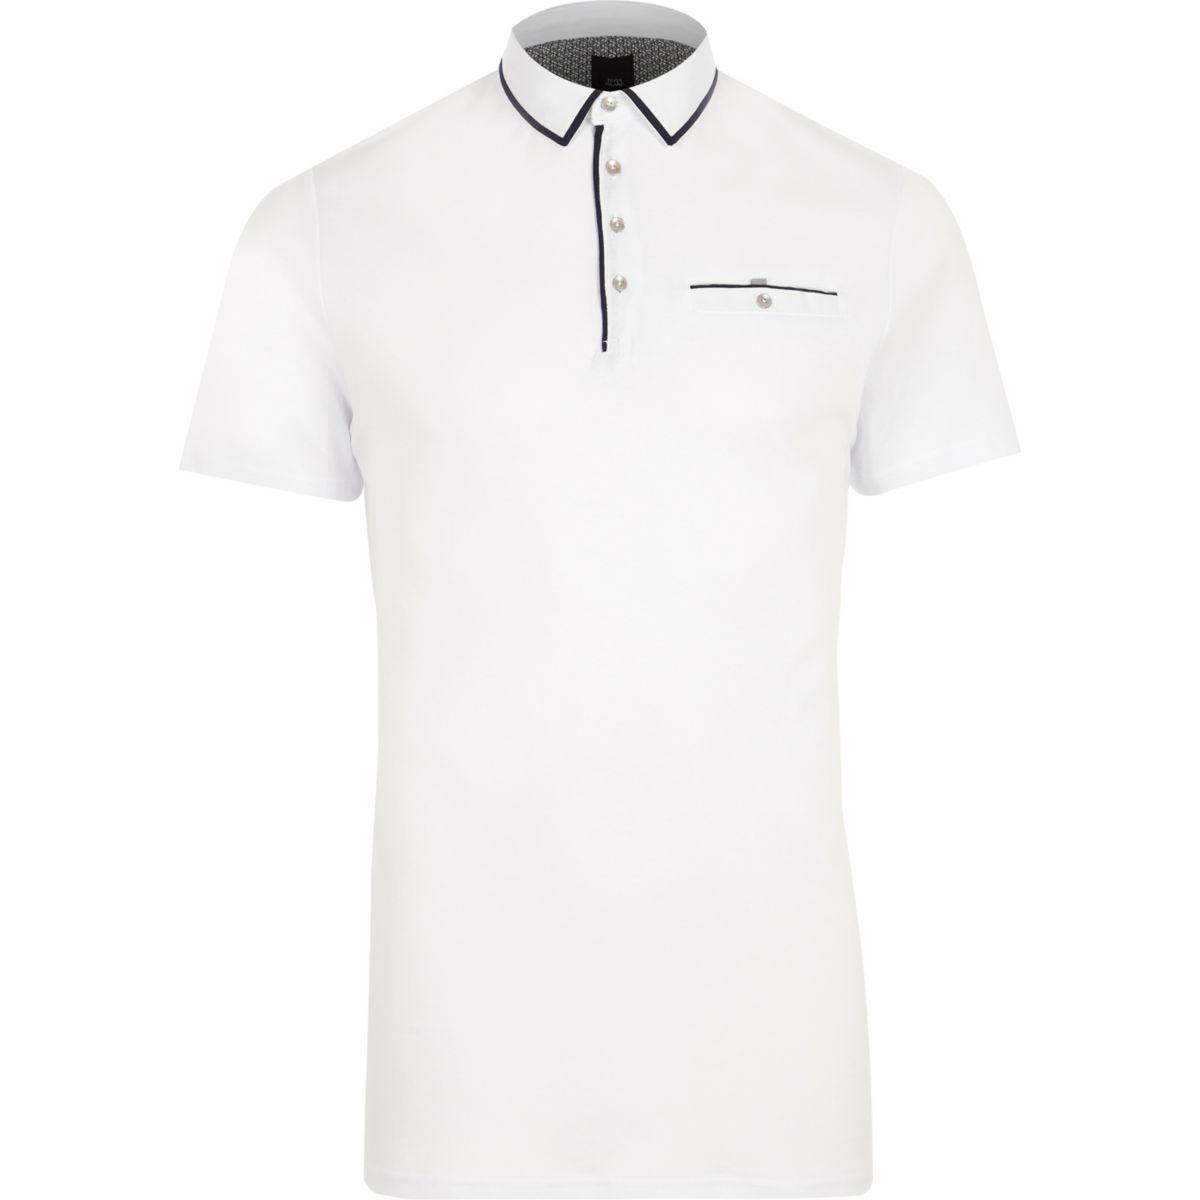 White contrast trim slim fit polo shirt